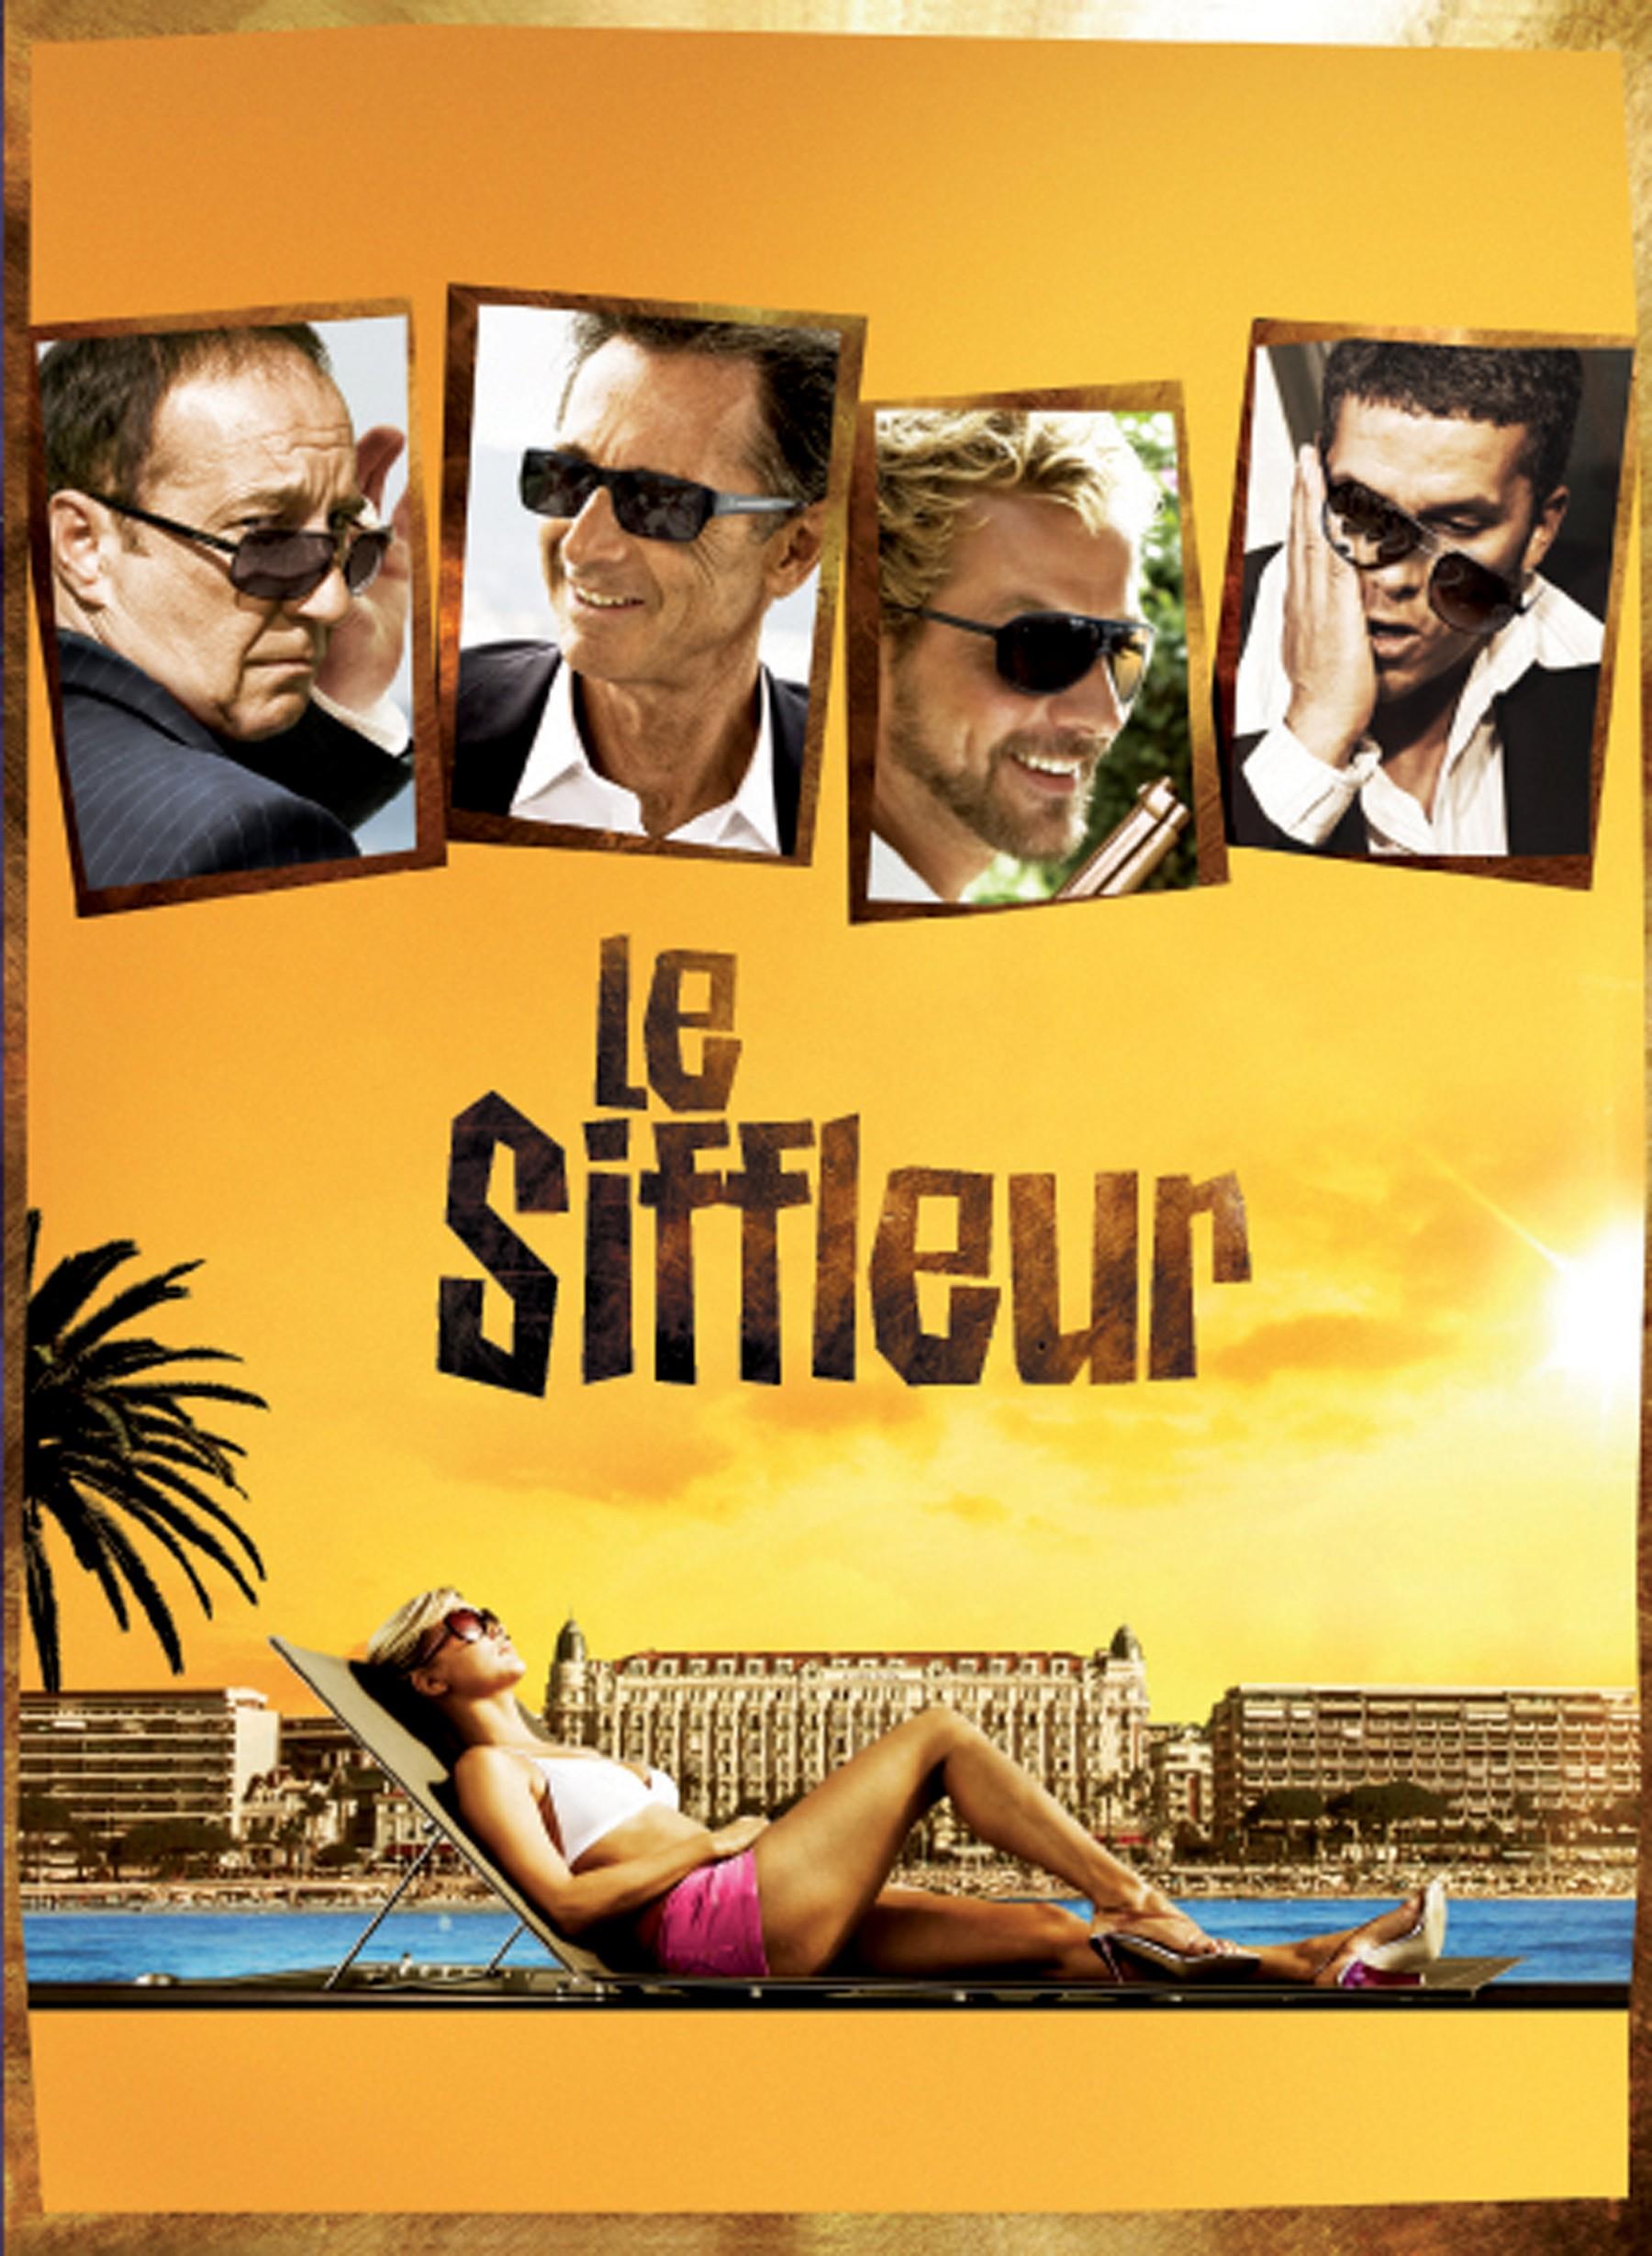 Le Siffleur [DVDRIP-AC3] [FRENCH] [MULTI]